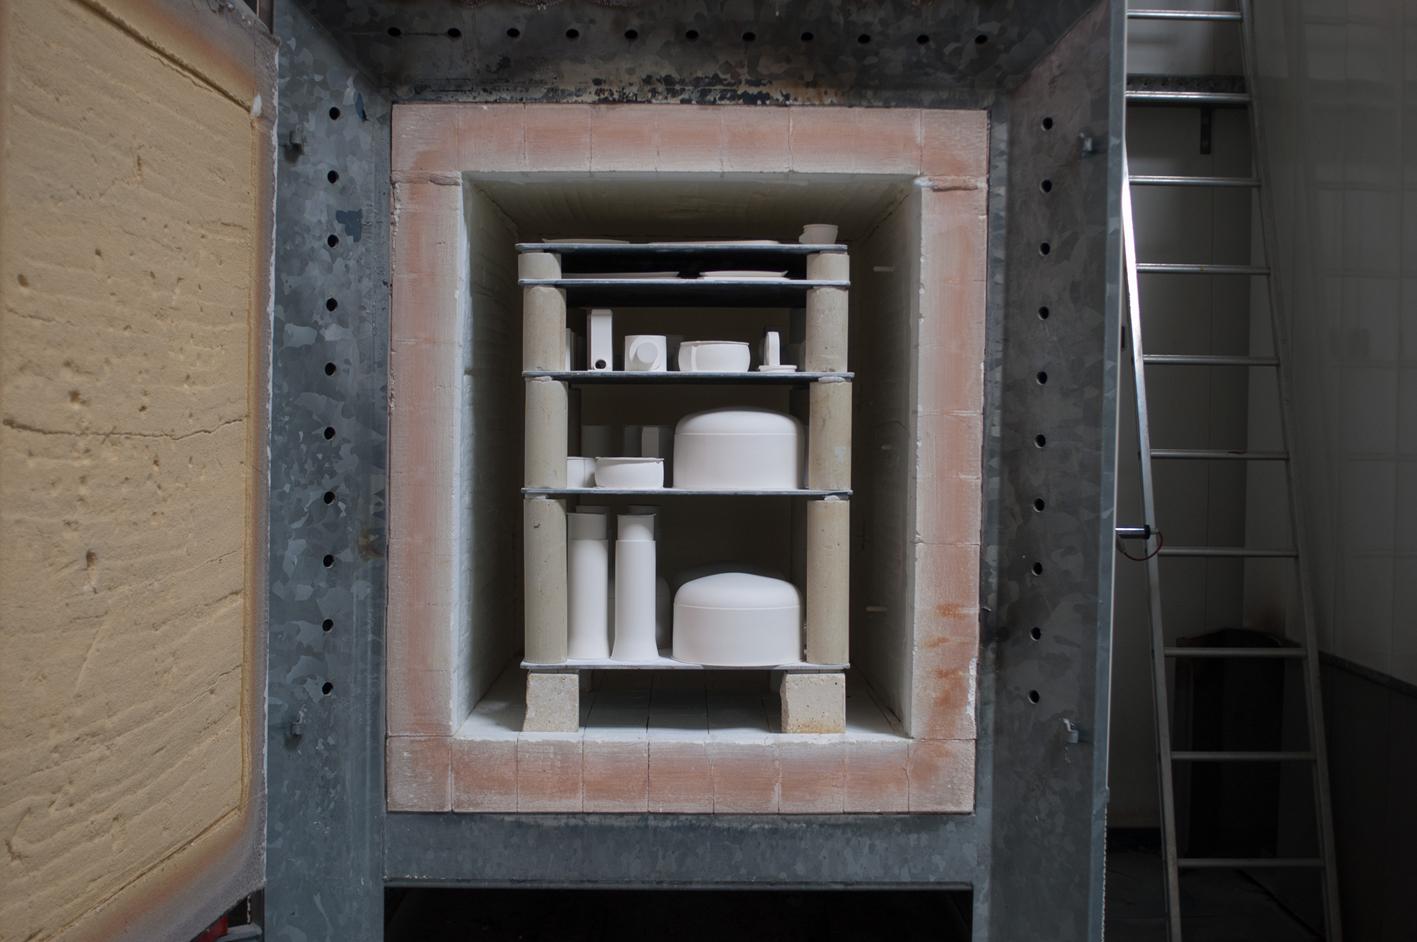 a9_minalemaeda_manufactured_ceramics_mdby_mdba_cadcam_tableware_kilnr